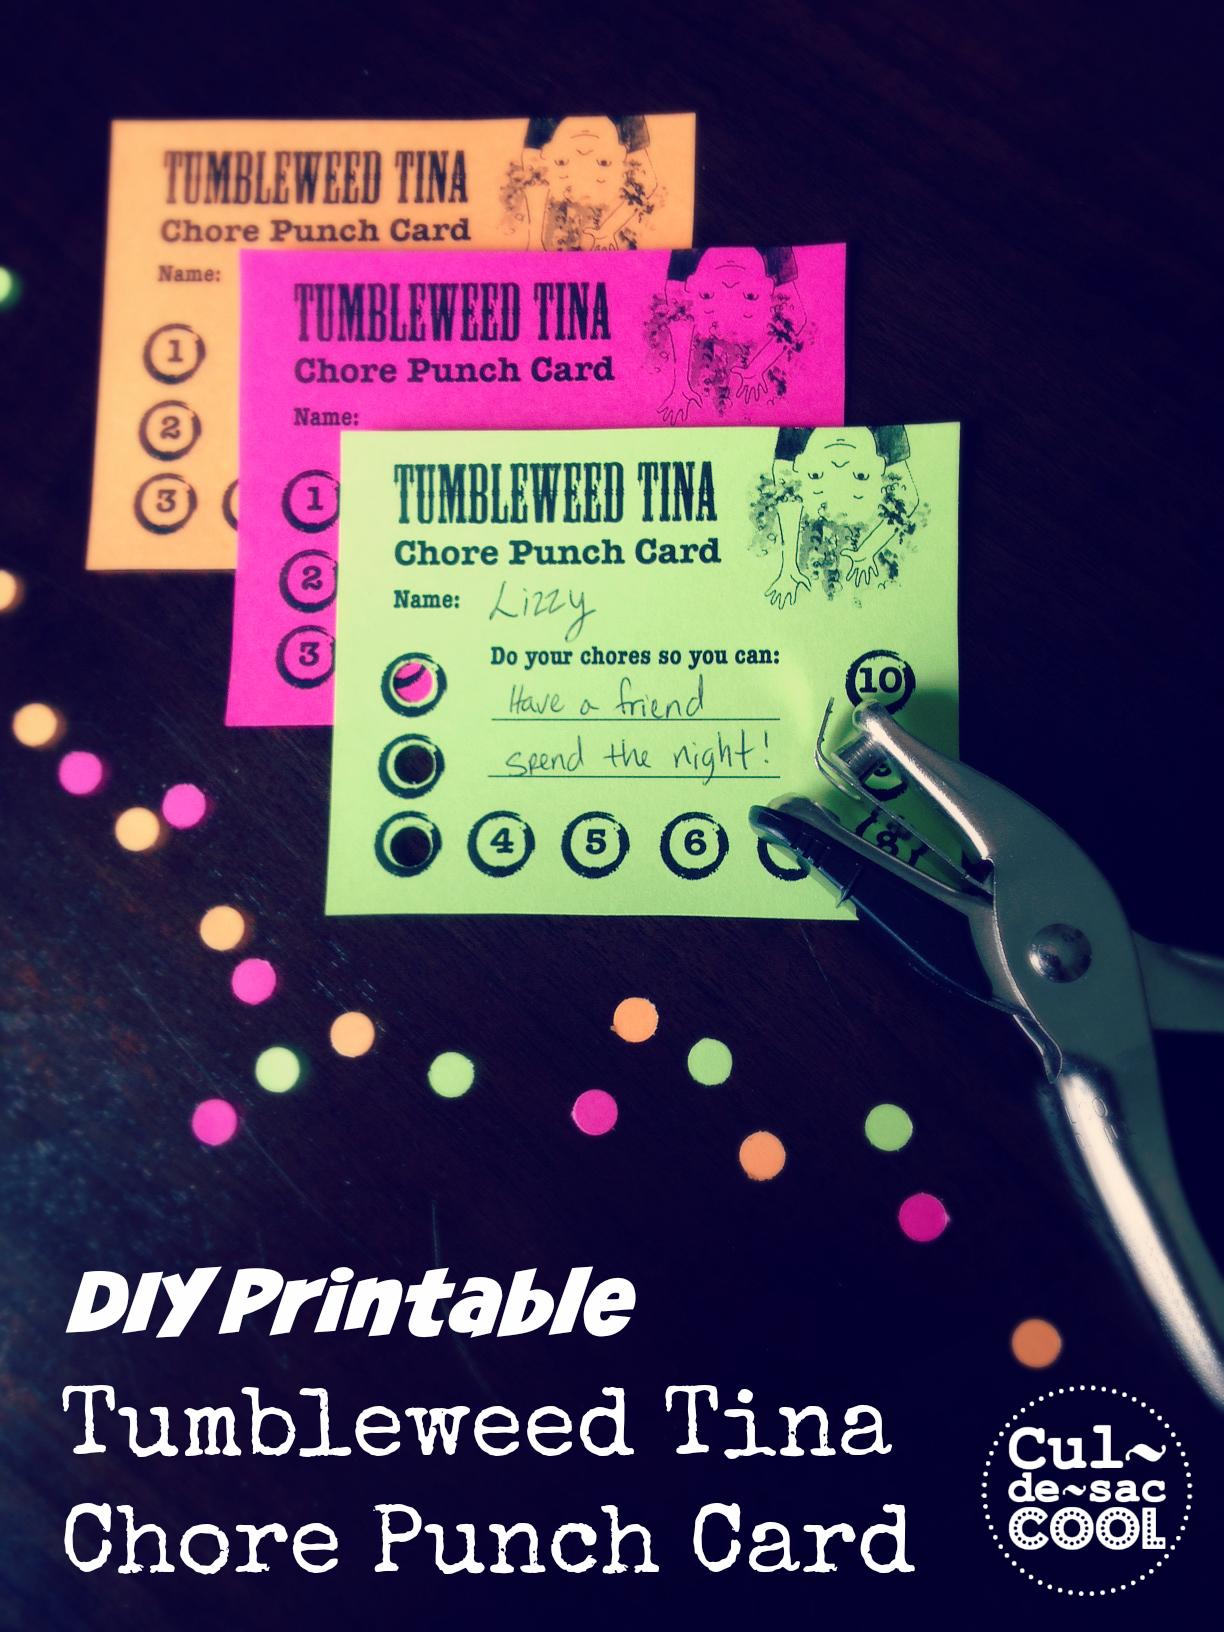 Tumbleweed Tina Chore Punch Card 4